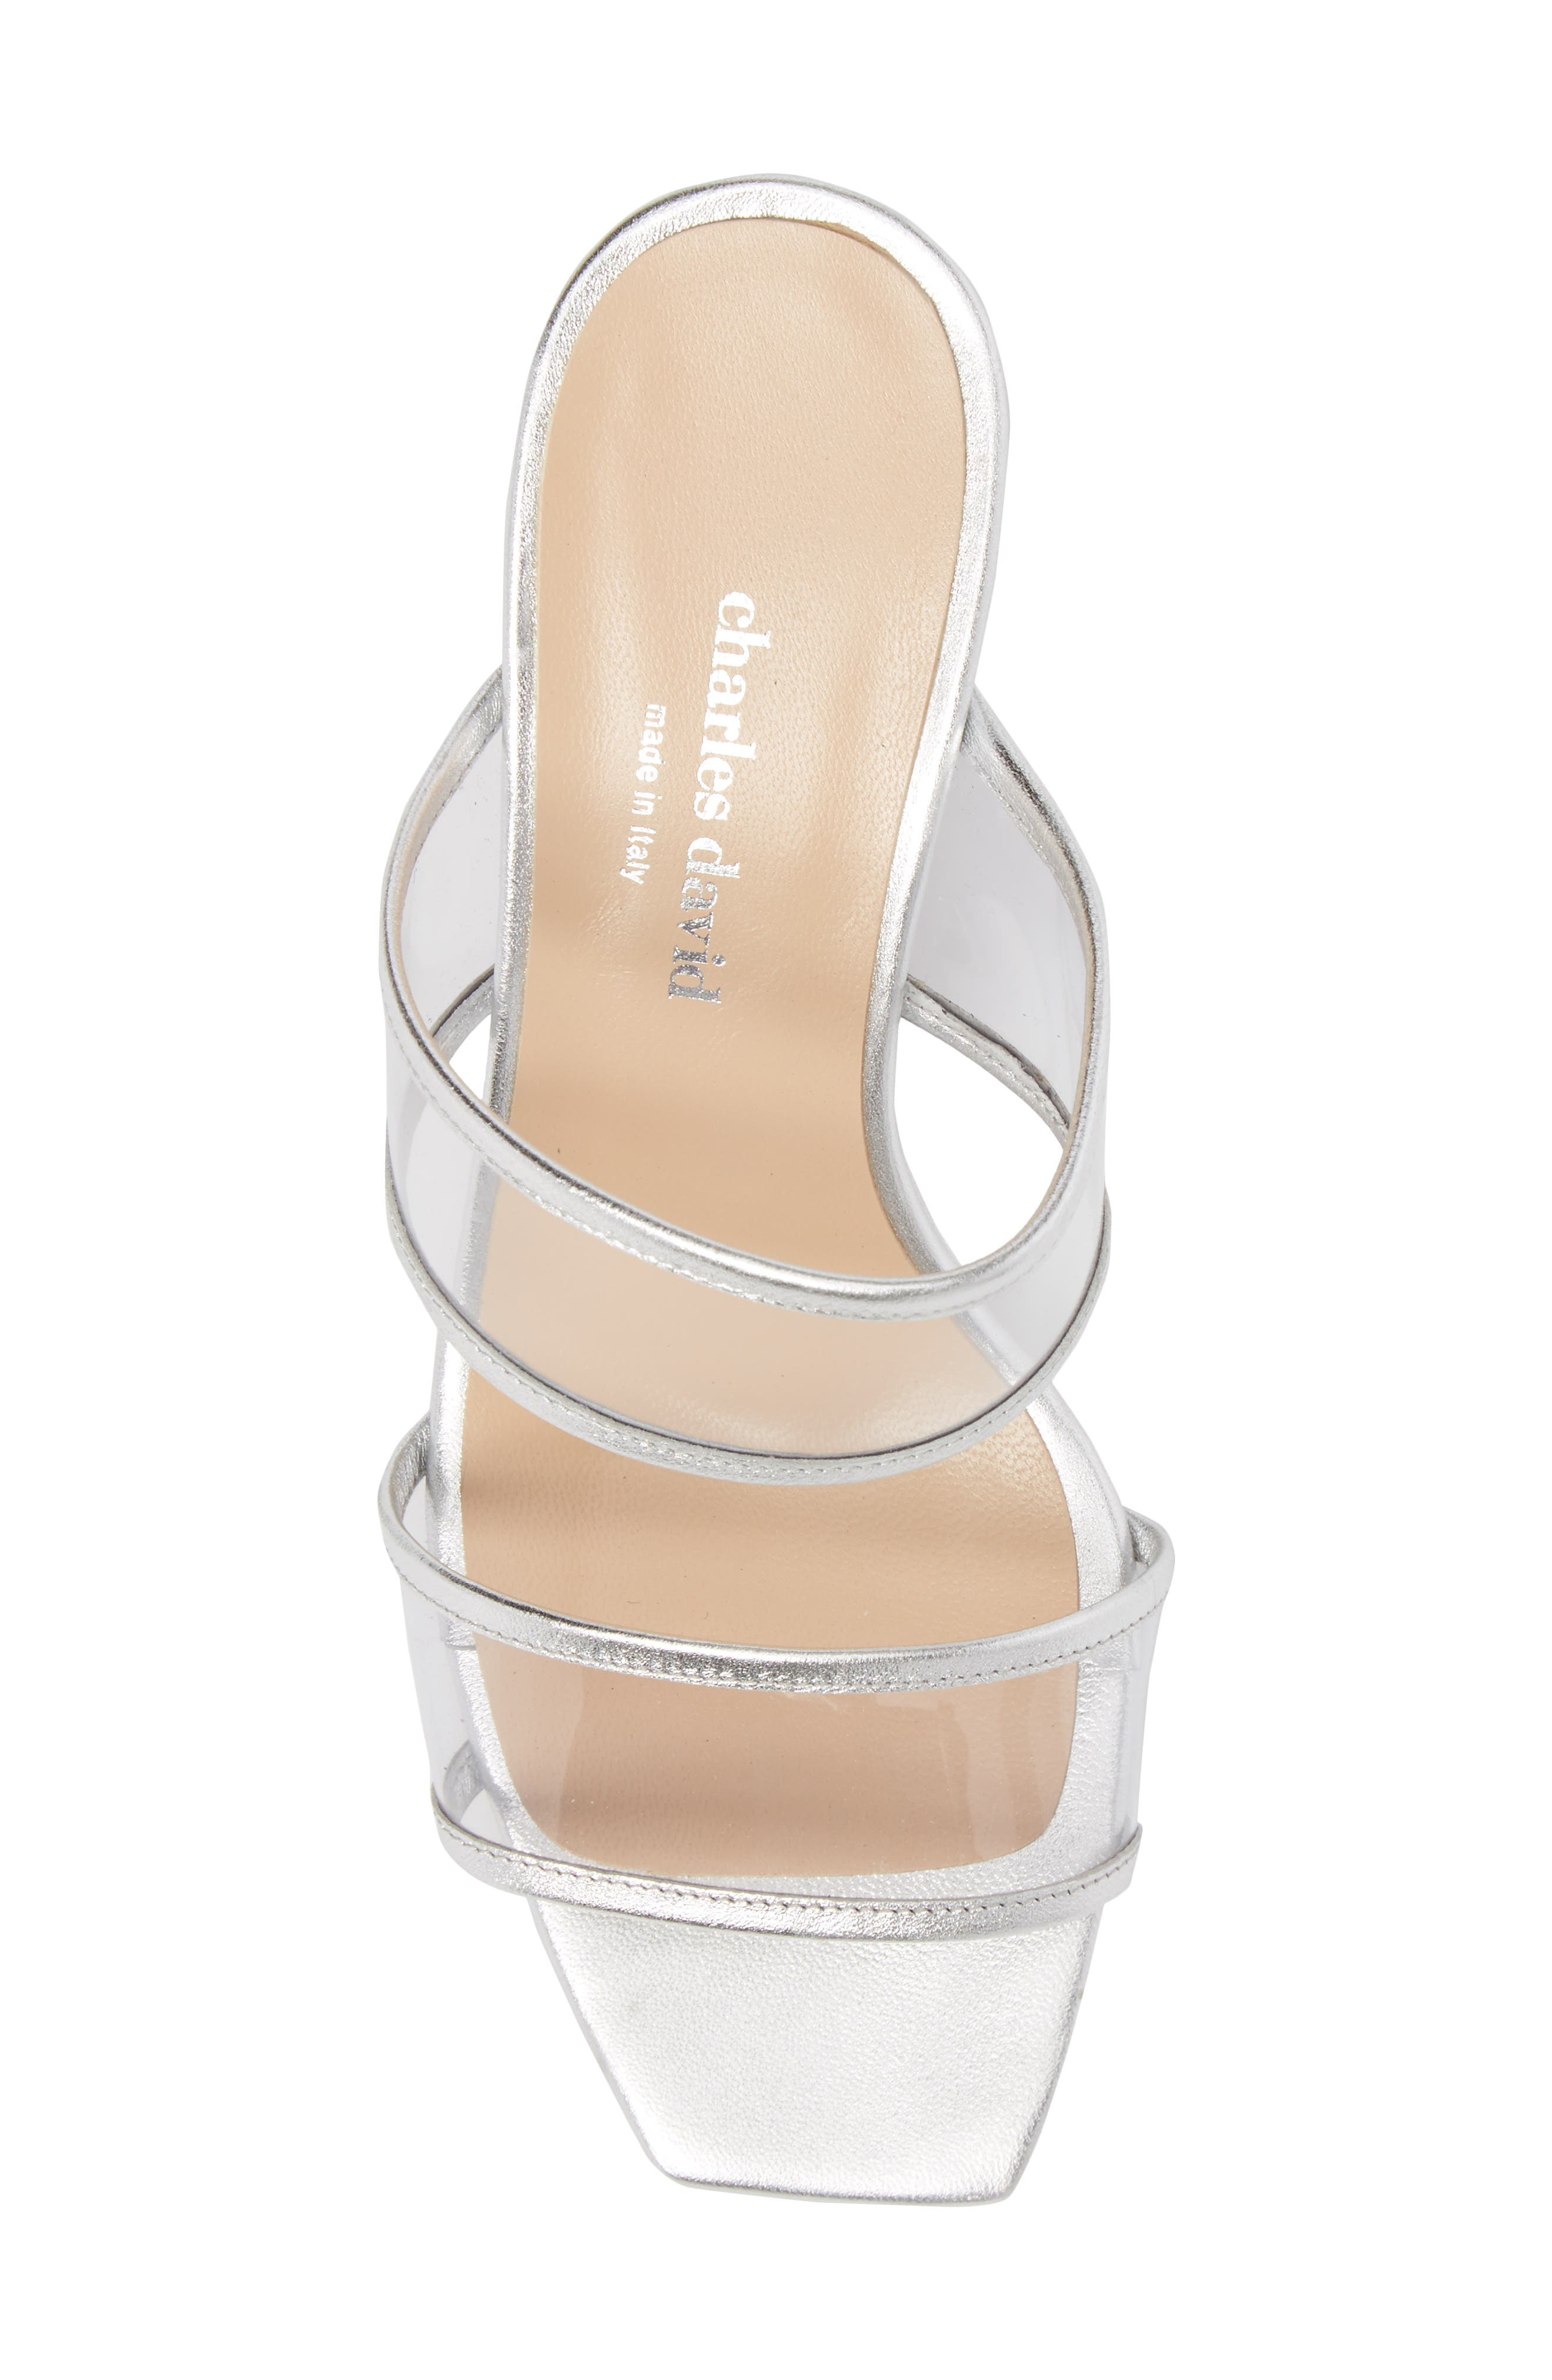 Cally Transparent Strap Slide Sandal,                             Alternate thumbnail 5, color,                             Silver